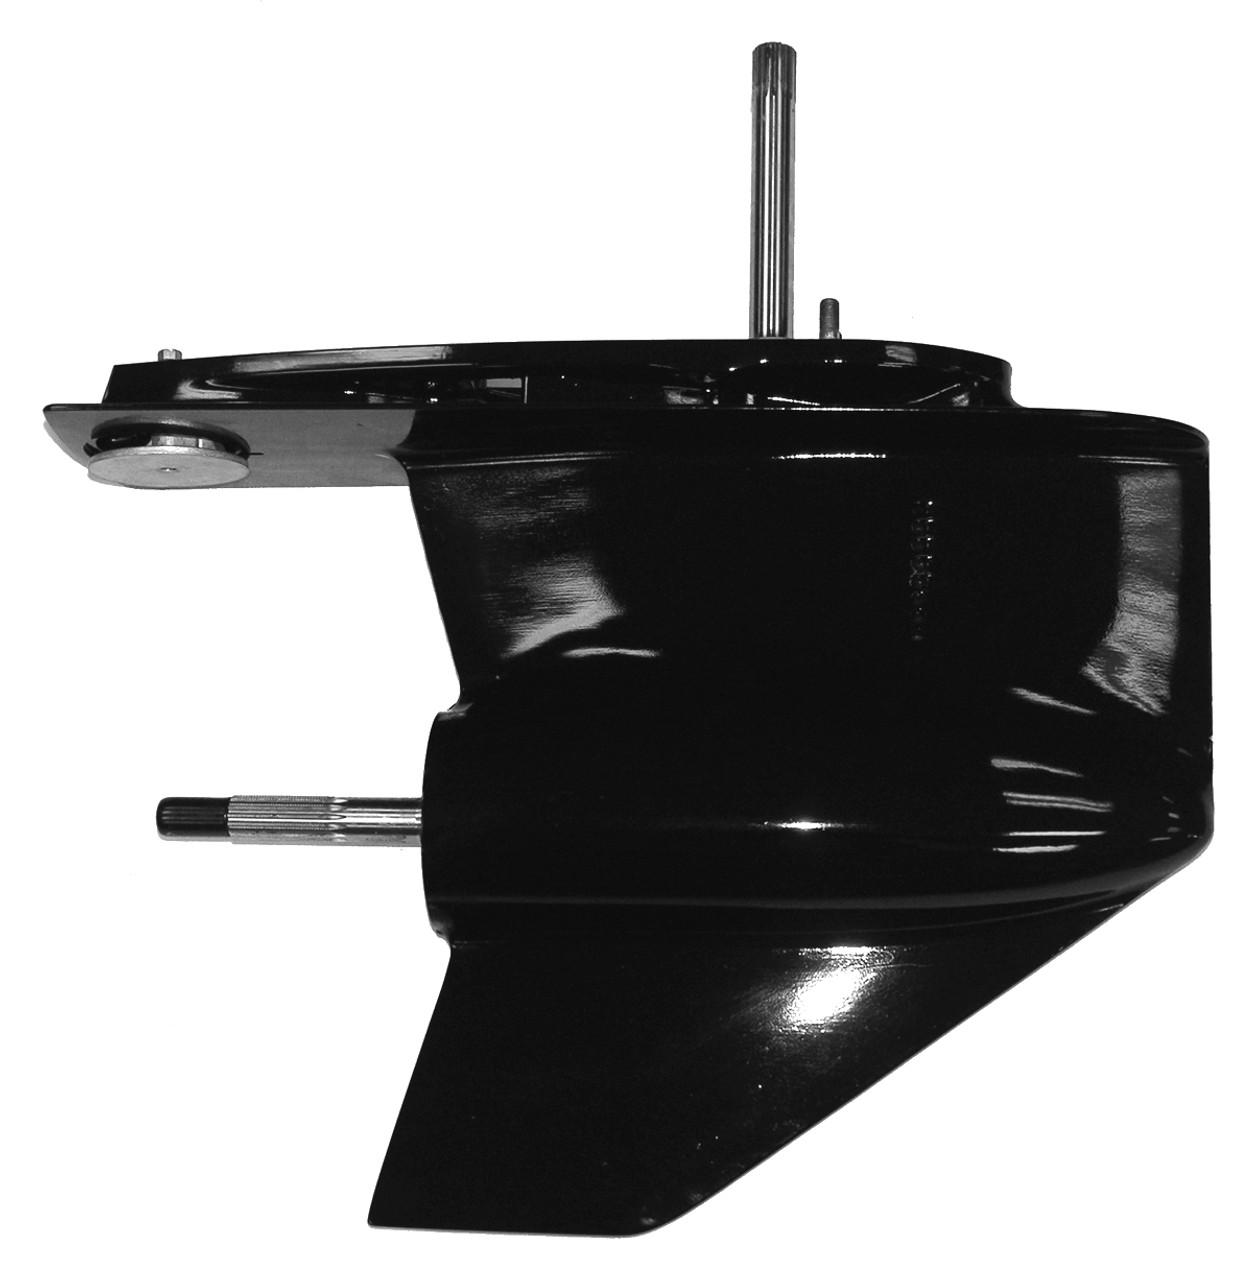 New OBR Mercruiser Bravo I Lower Drive Shaft Assembly [1995-2018]